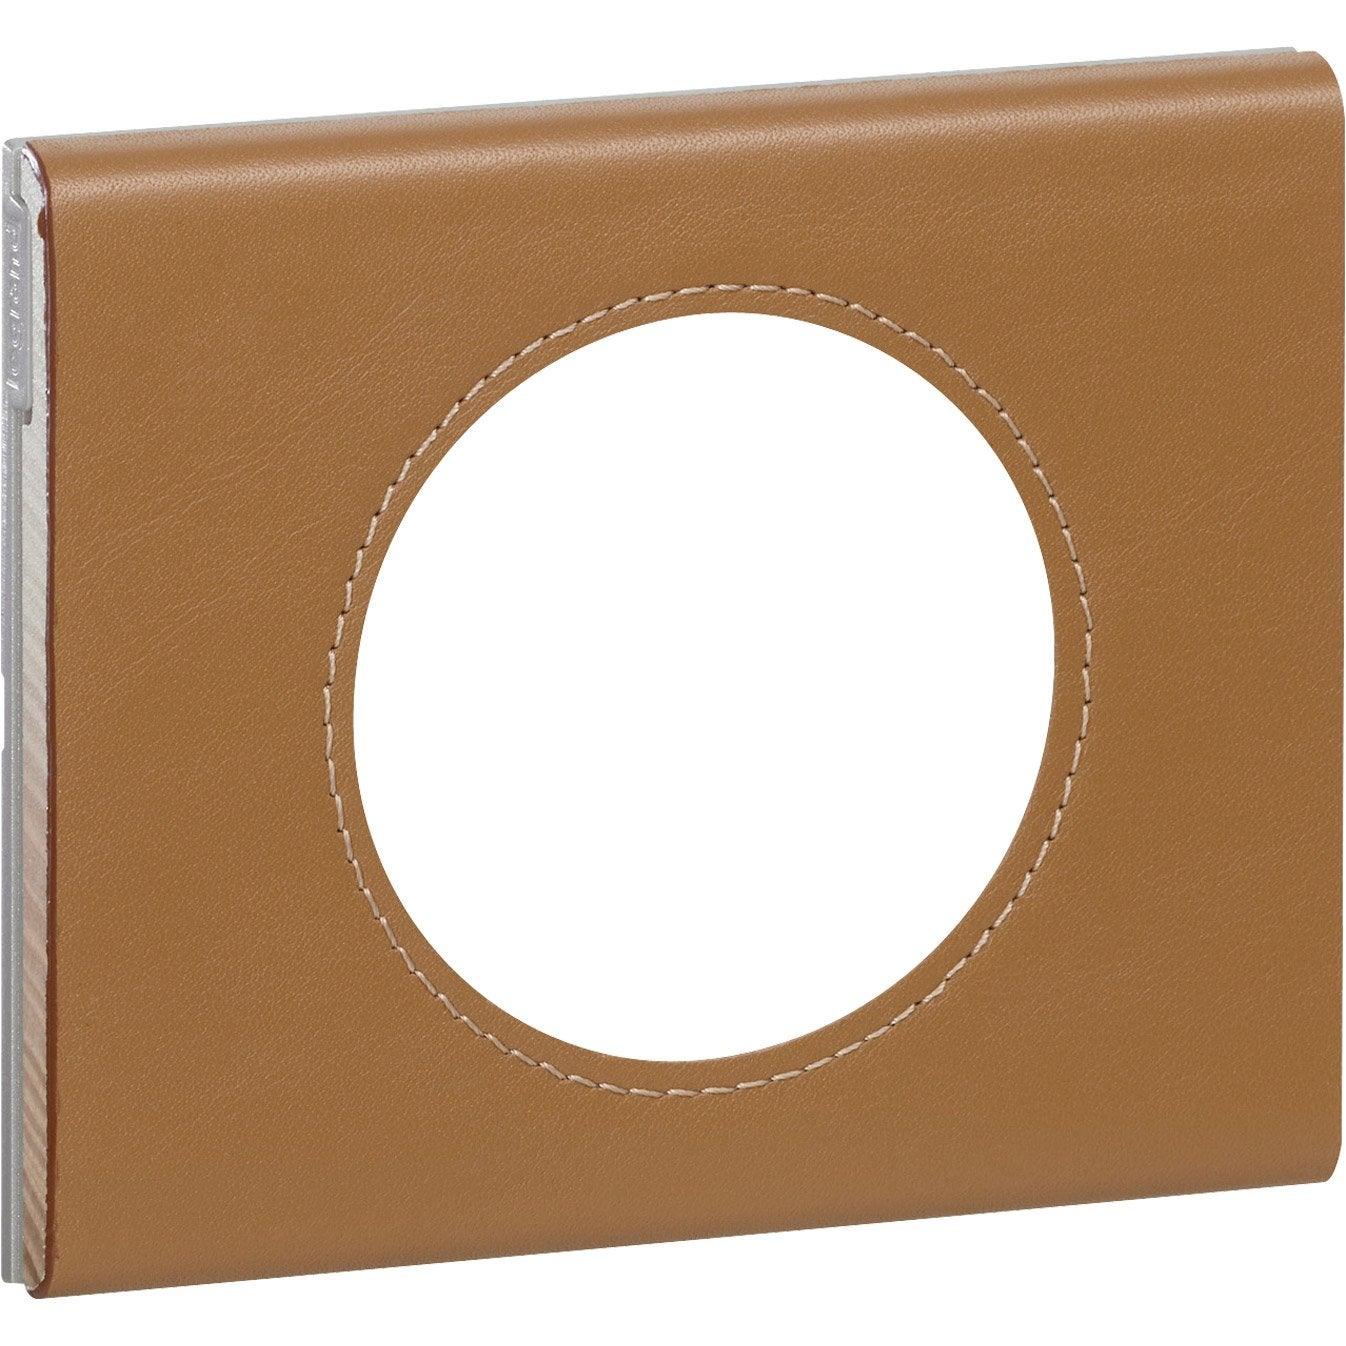 plaque c liane legrand caramel mat leroy merlin. Black Bedroom Furniture Sets. Home Design Ideas